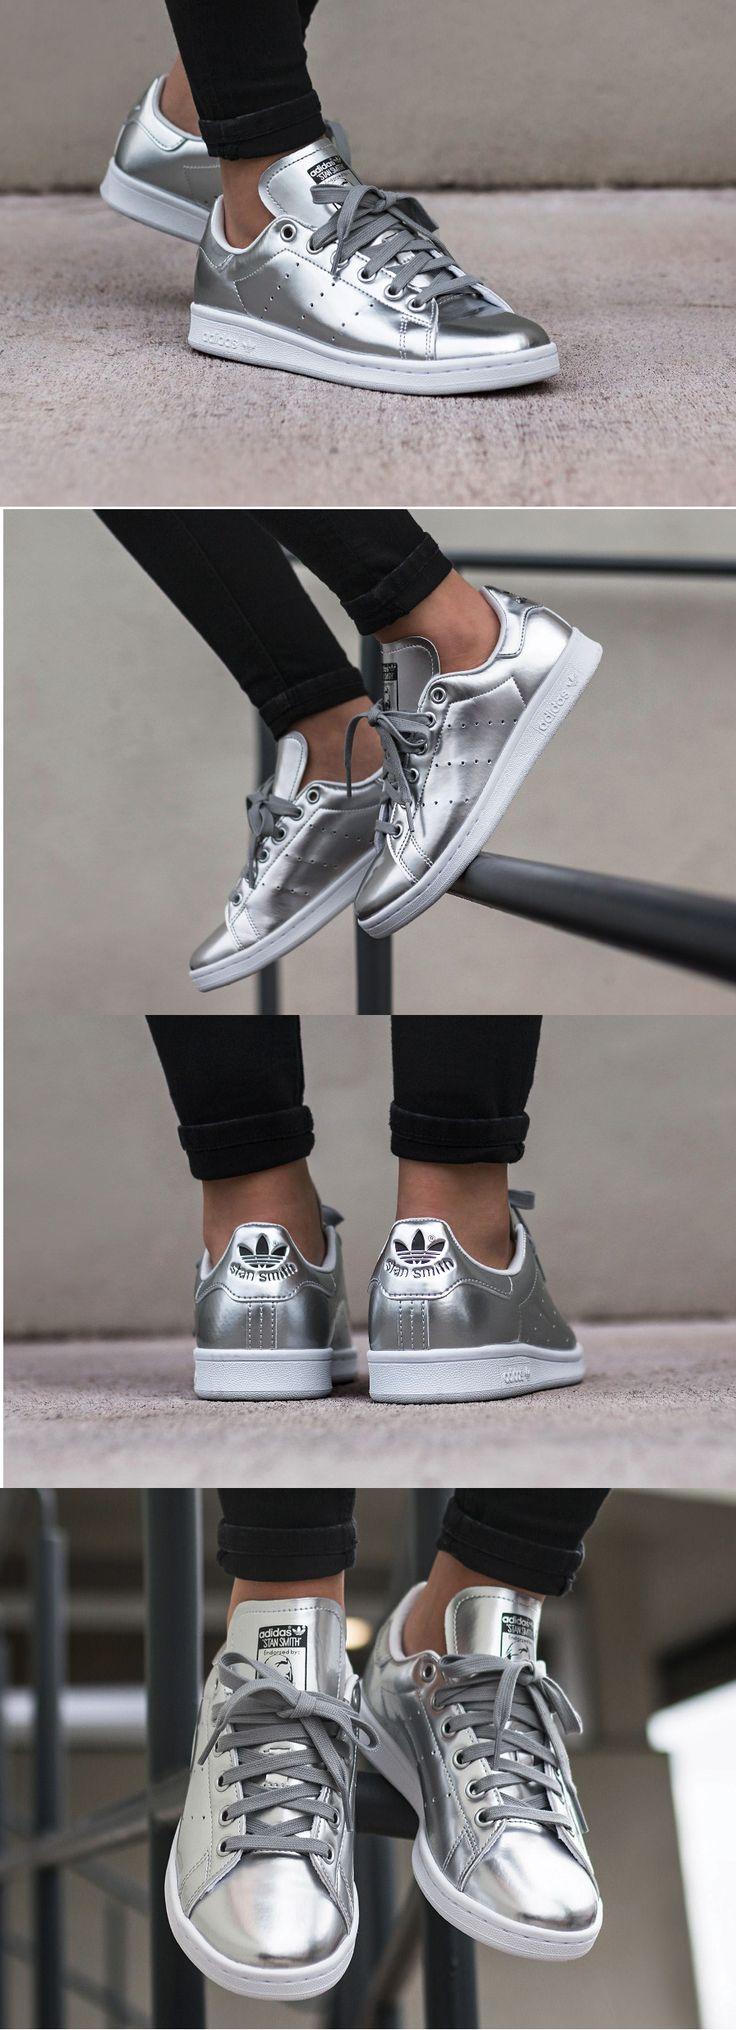 #Adidas #Stan #Smith W #Silver #Metallic http://www.adidas.fr/chaussure-stan-smith/CG3679.html?cm_mmc=AdieAffiliates_PHG-_-sneakersactus-_-home-_-bs-&cm_mmca1=FR&dclid=CPjQxvbx09ICFXgC0wodXLwDmw